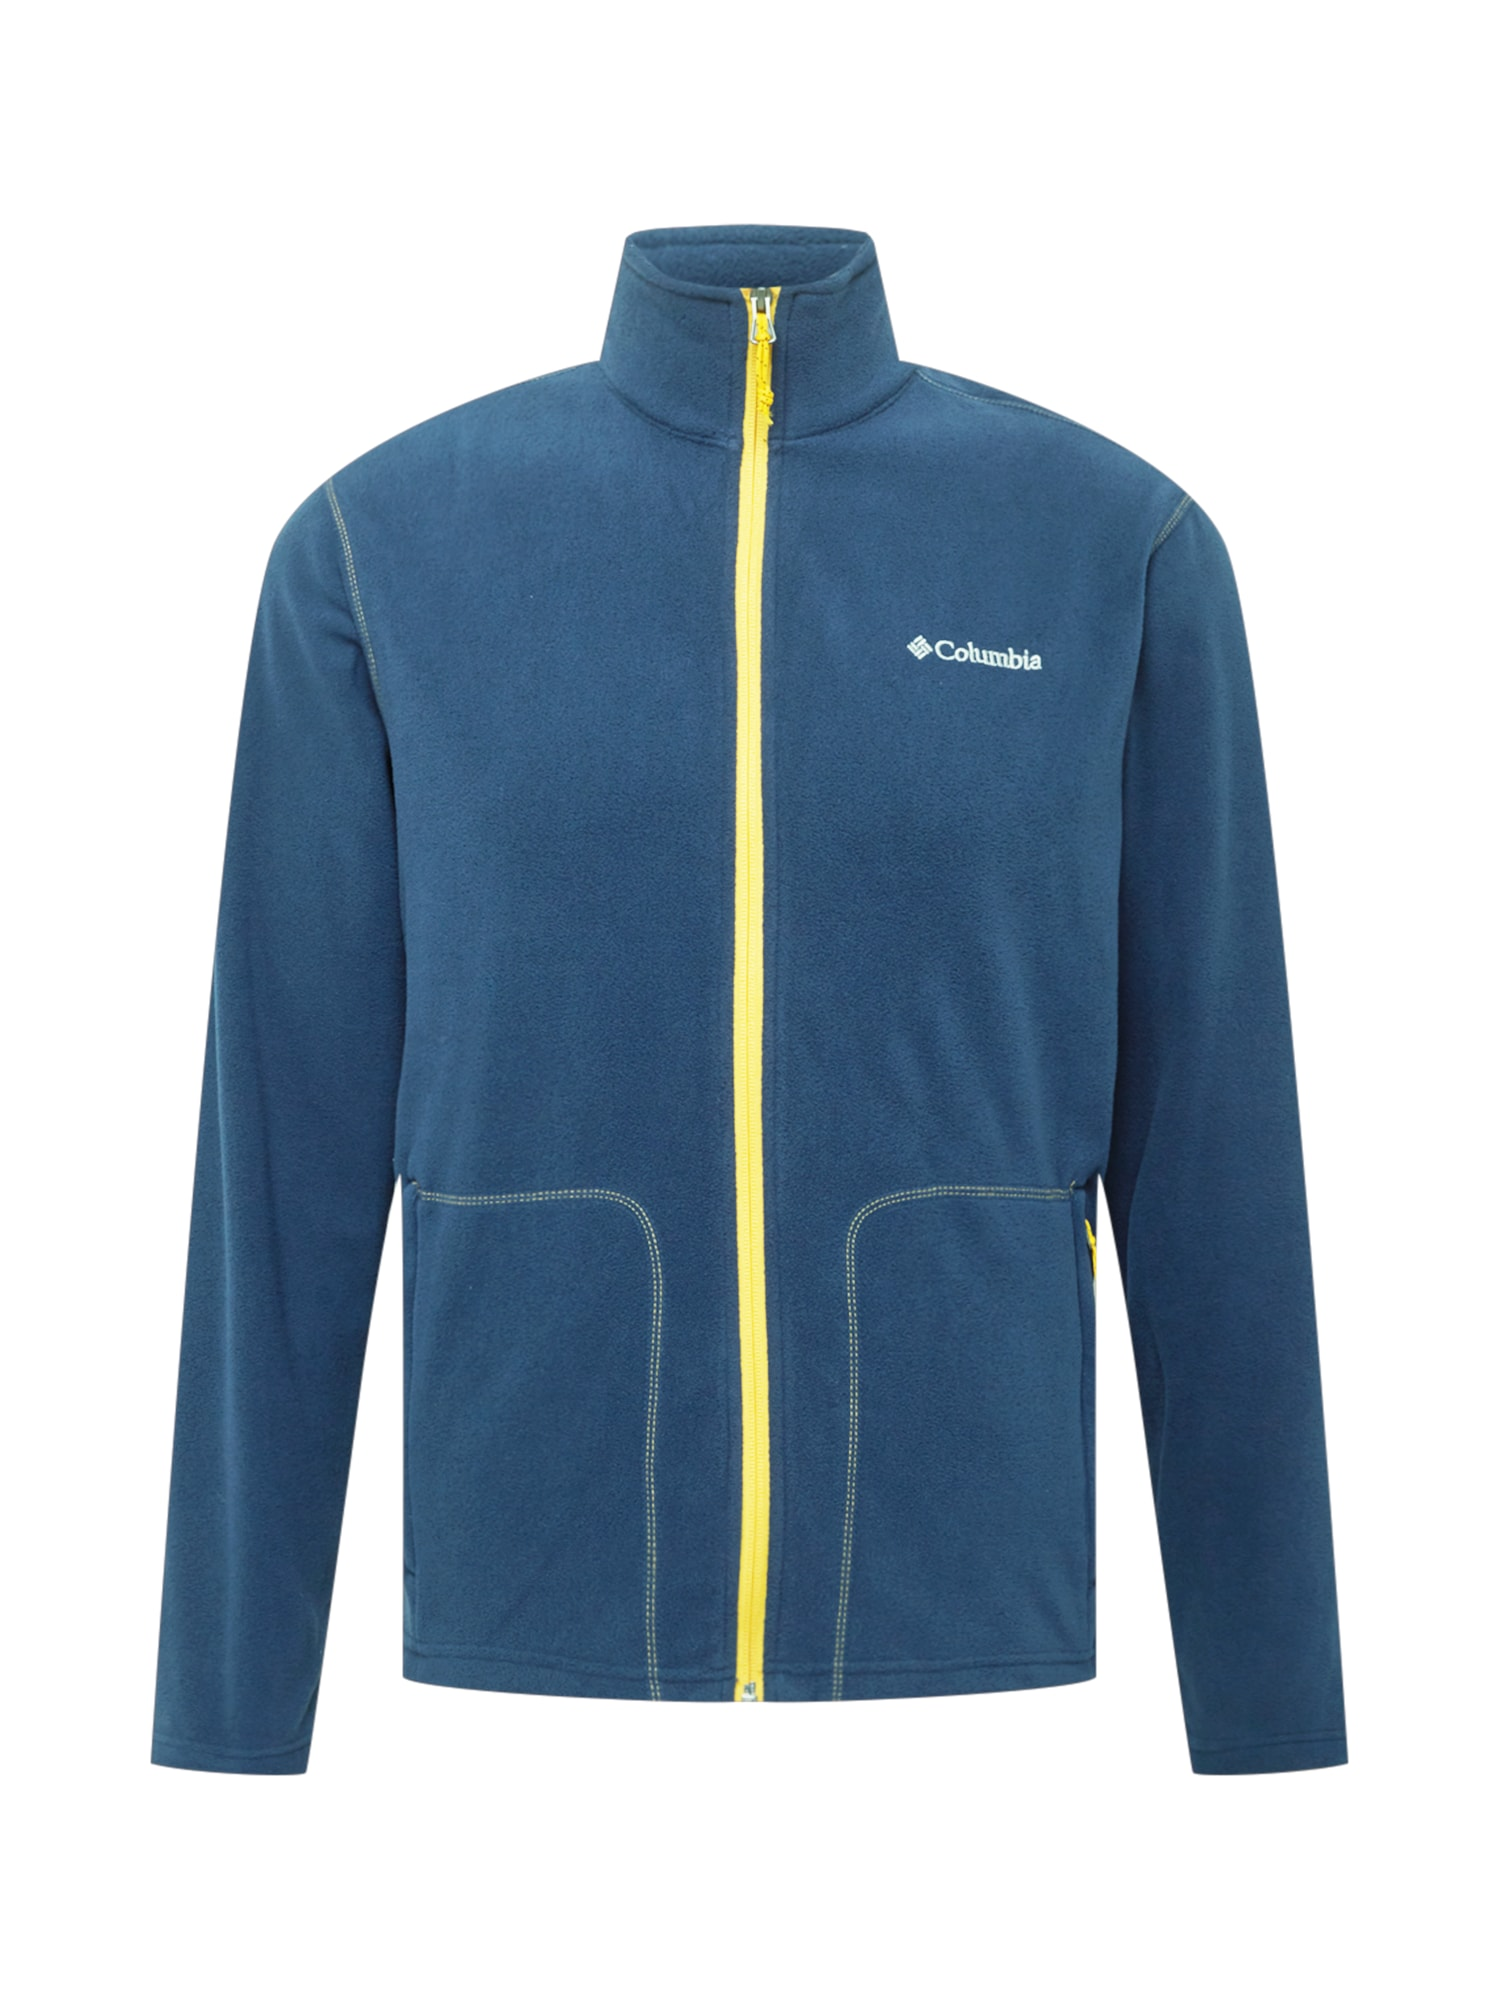 COLUMBIA Flisinis džemperis tamsiai mėlyna / geltona